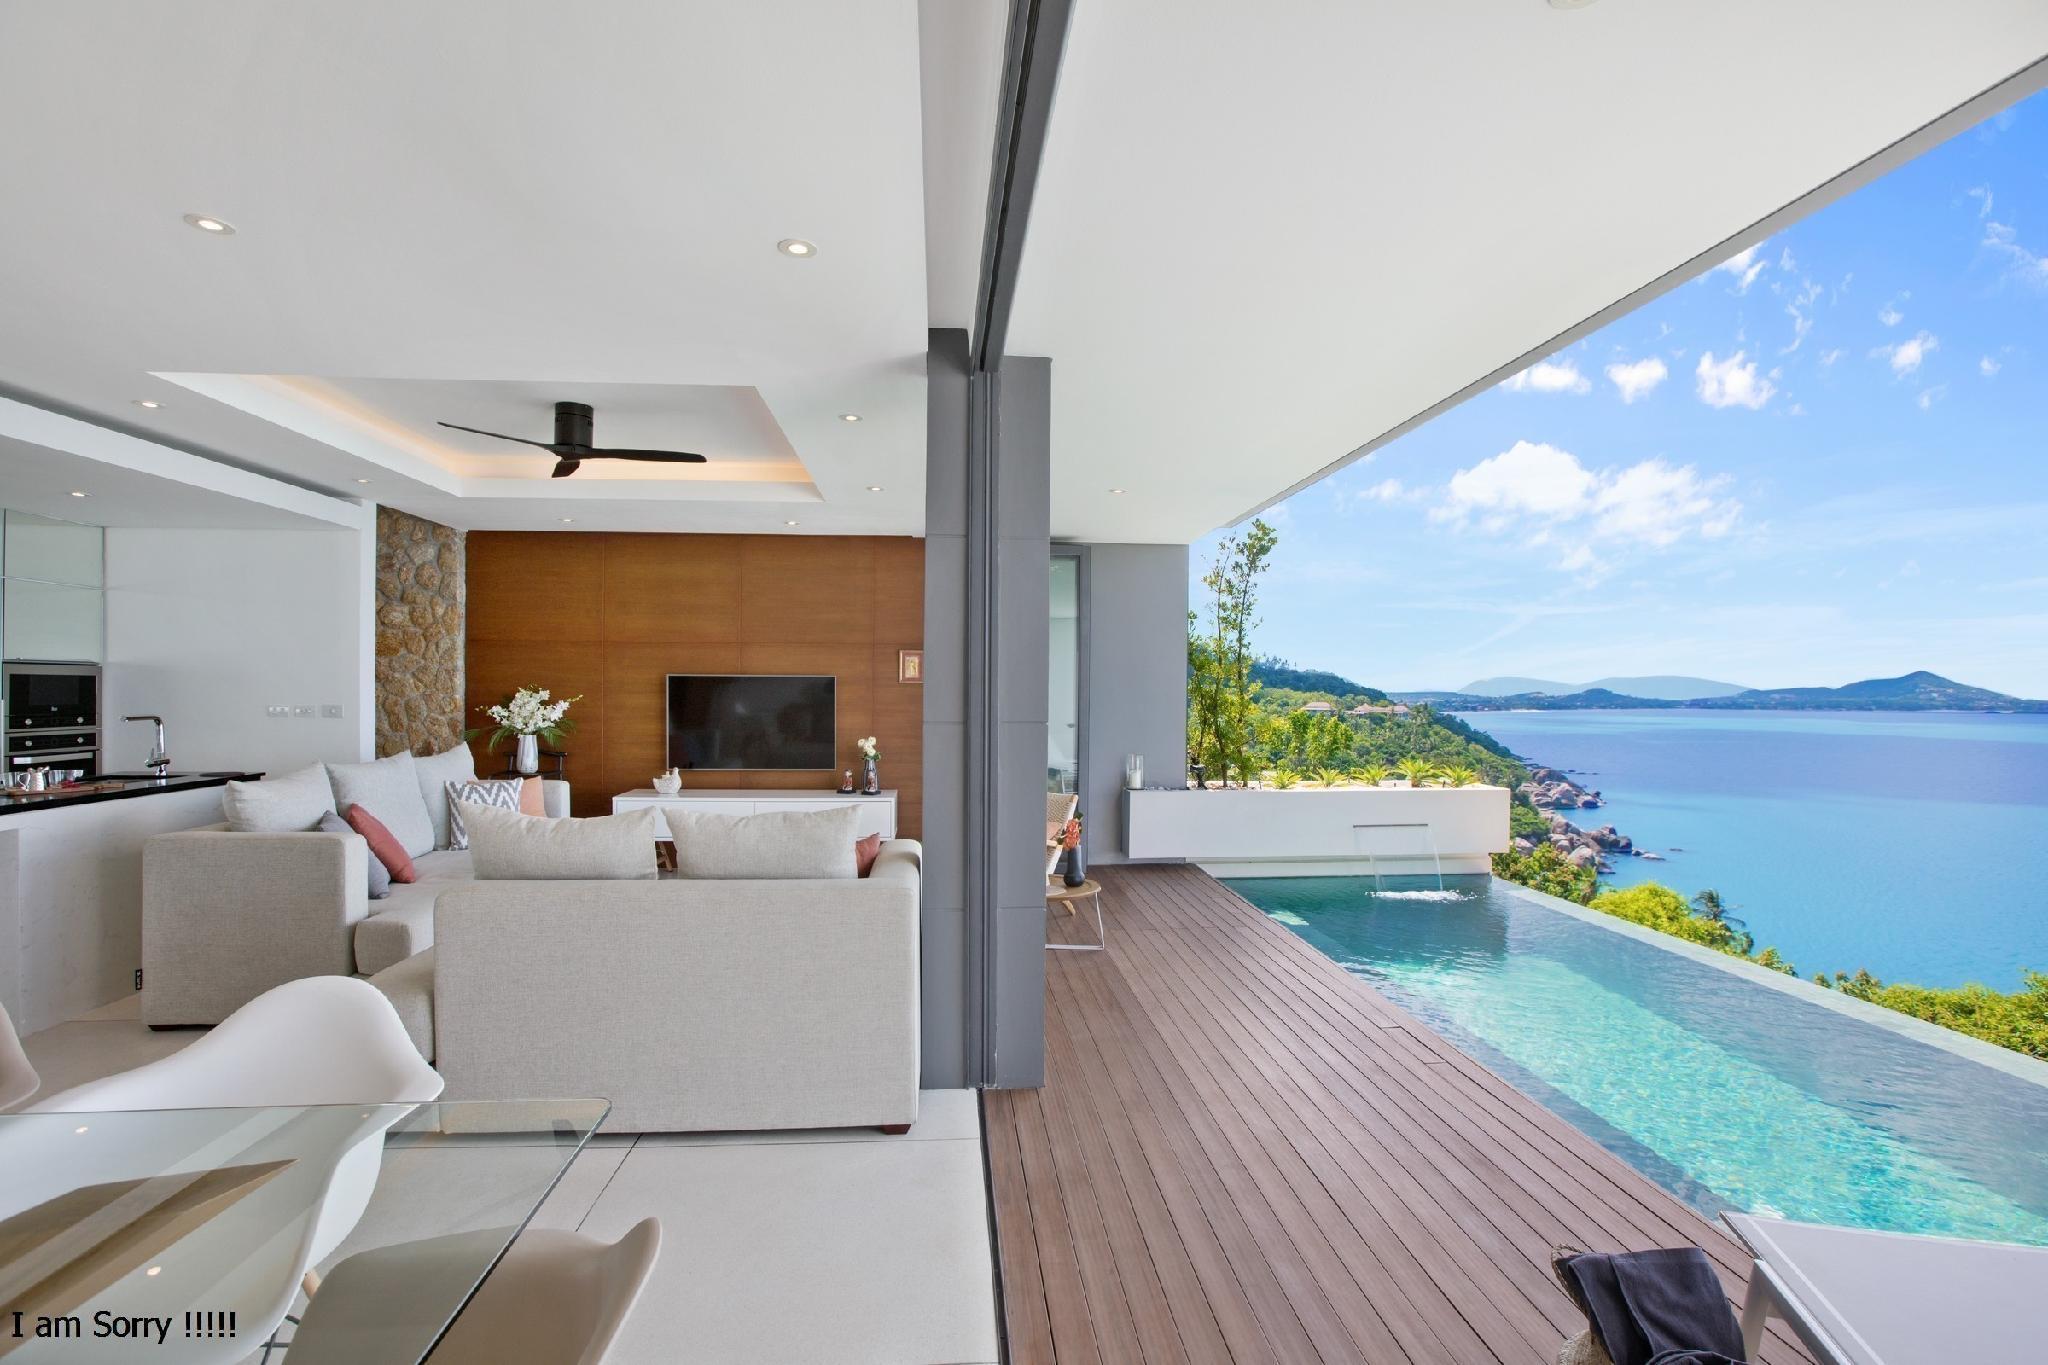 Villa Channary by Sukkho Samui Estates วิลลา 2 ห้องนอน 2 ห้องน้ำส่วนตัว ขนาด 155 ตร.ม. – หาดละไม